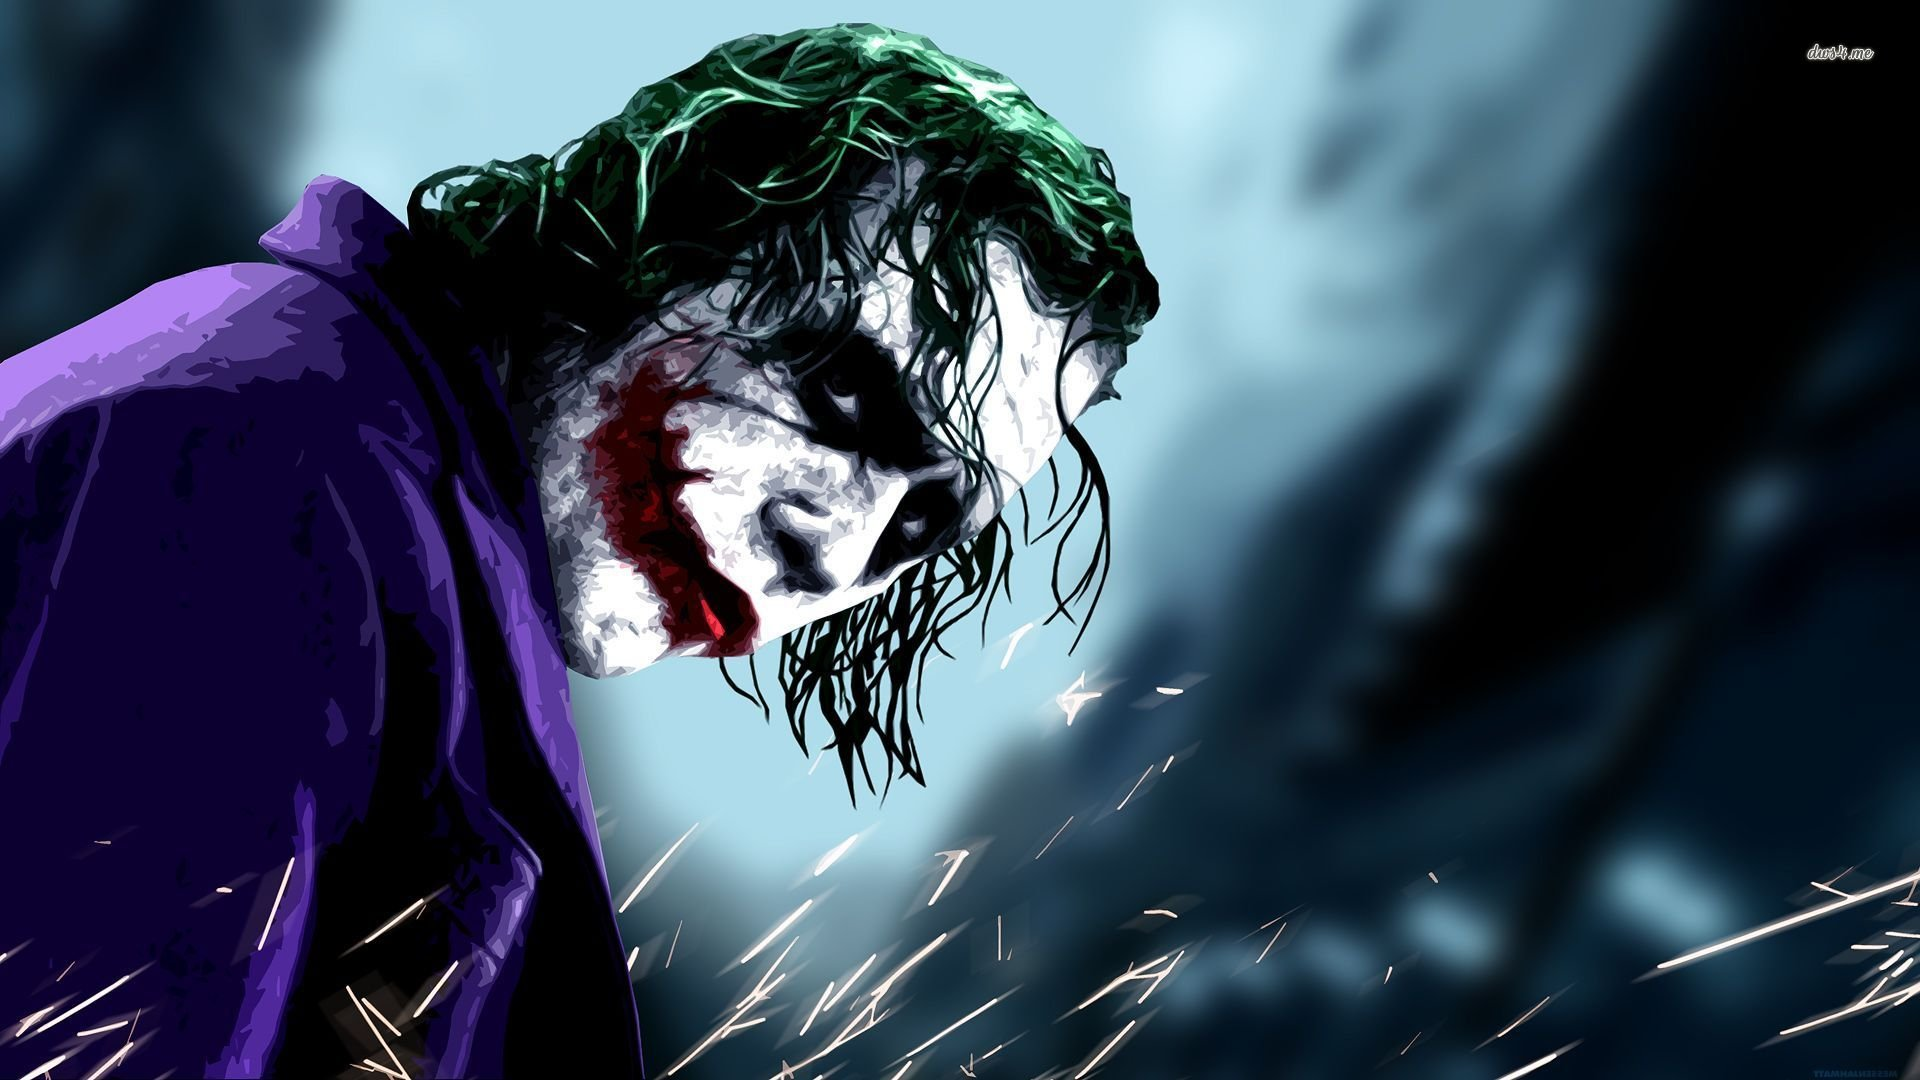 Joker Quotes Wallpaper Hd The Joker Dark Knight Wallpapers 53 Wallpapers